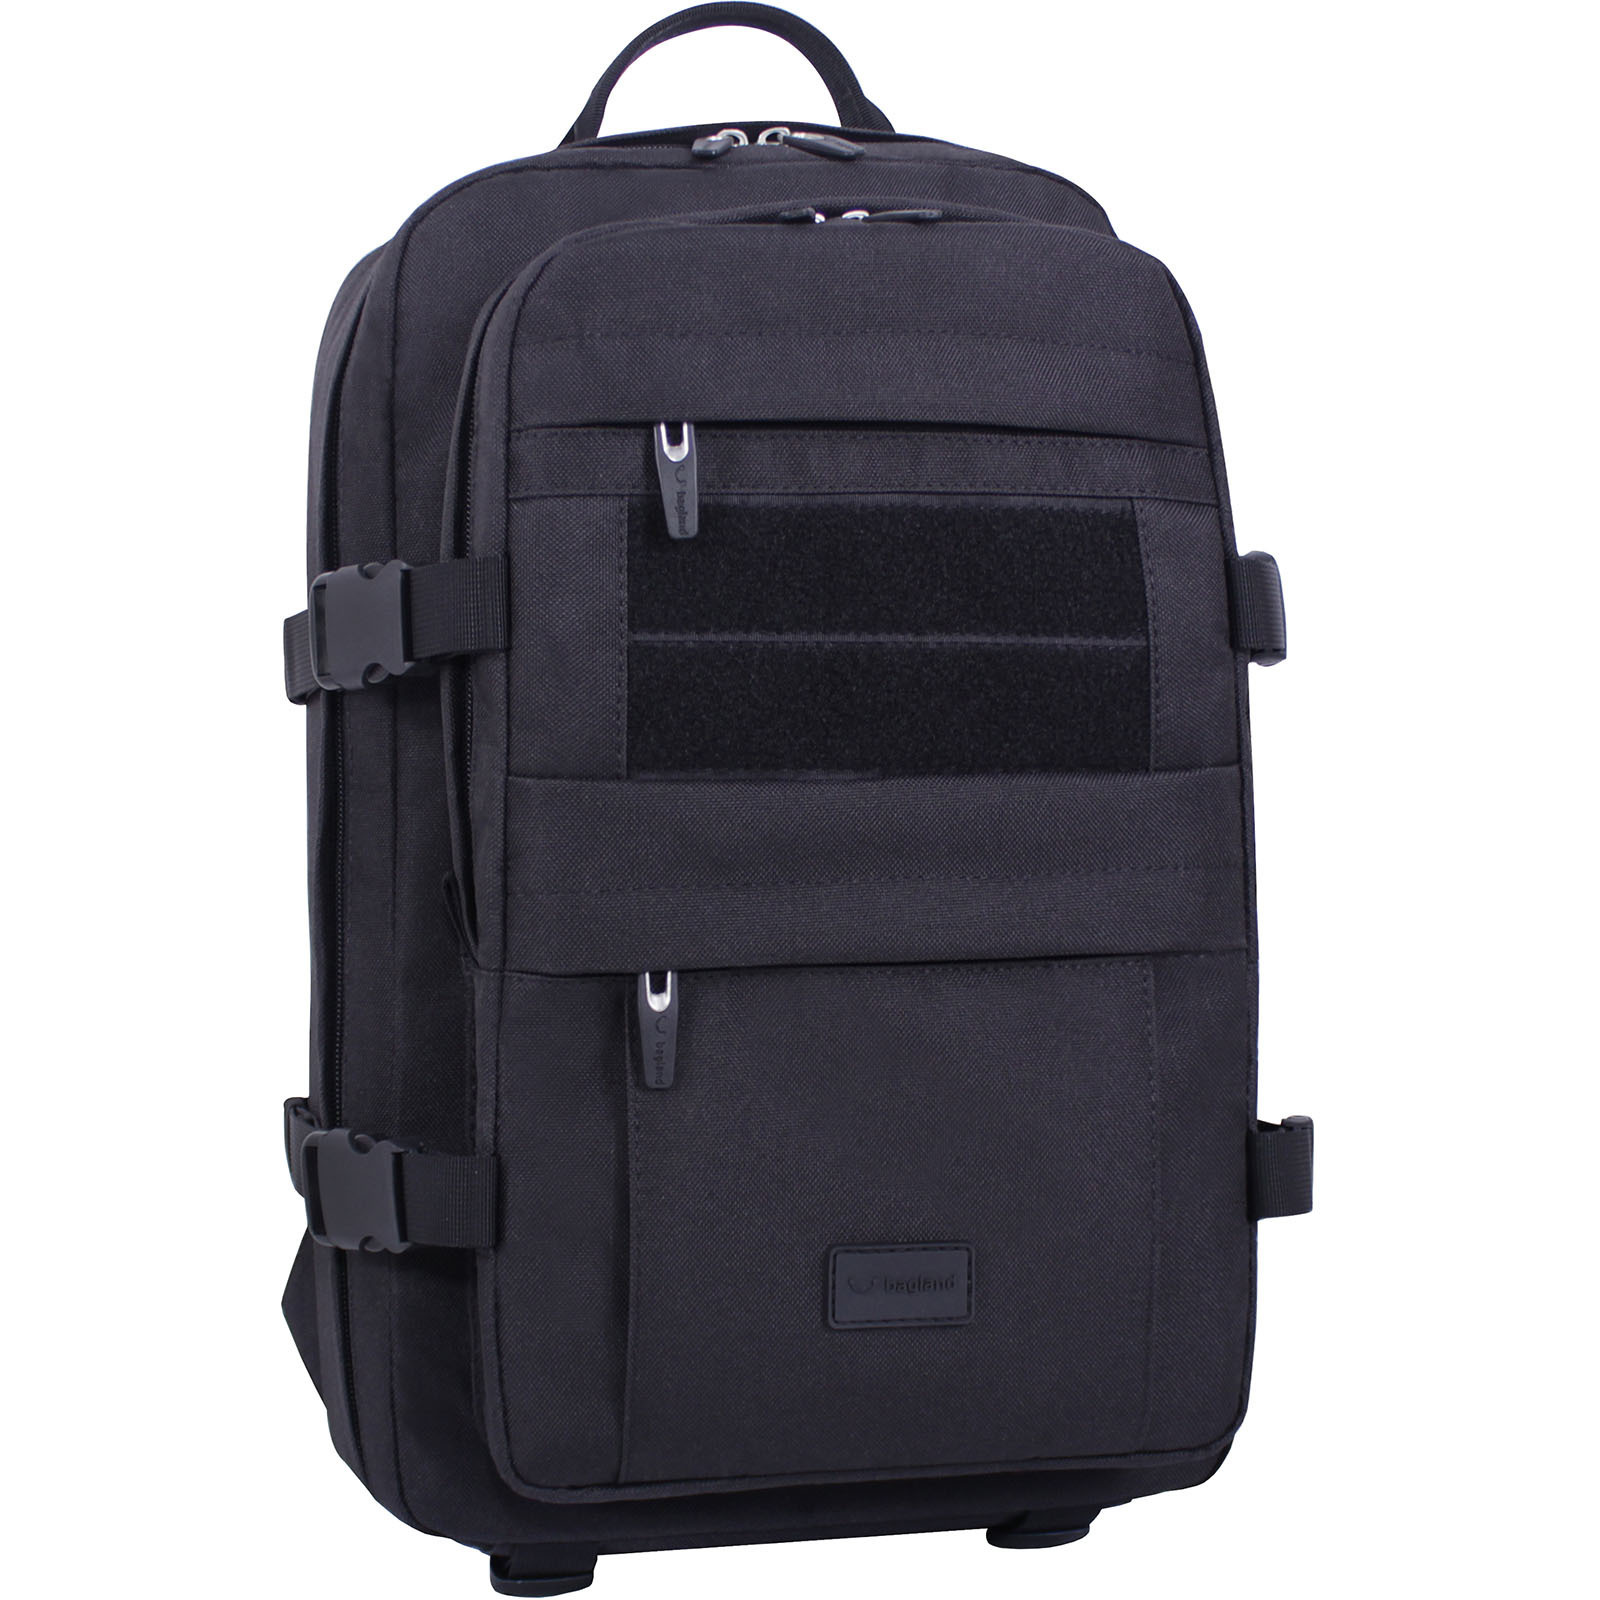 Мужские рюкзаки Рюкзак для ноутбука Bagland Jasper 19 л. Чёрный (0015566) IMG_3012.JPG